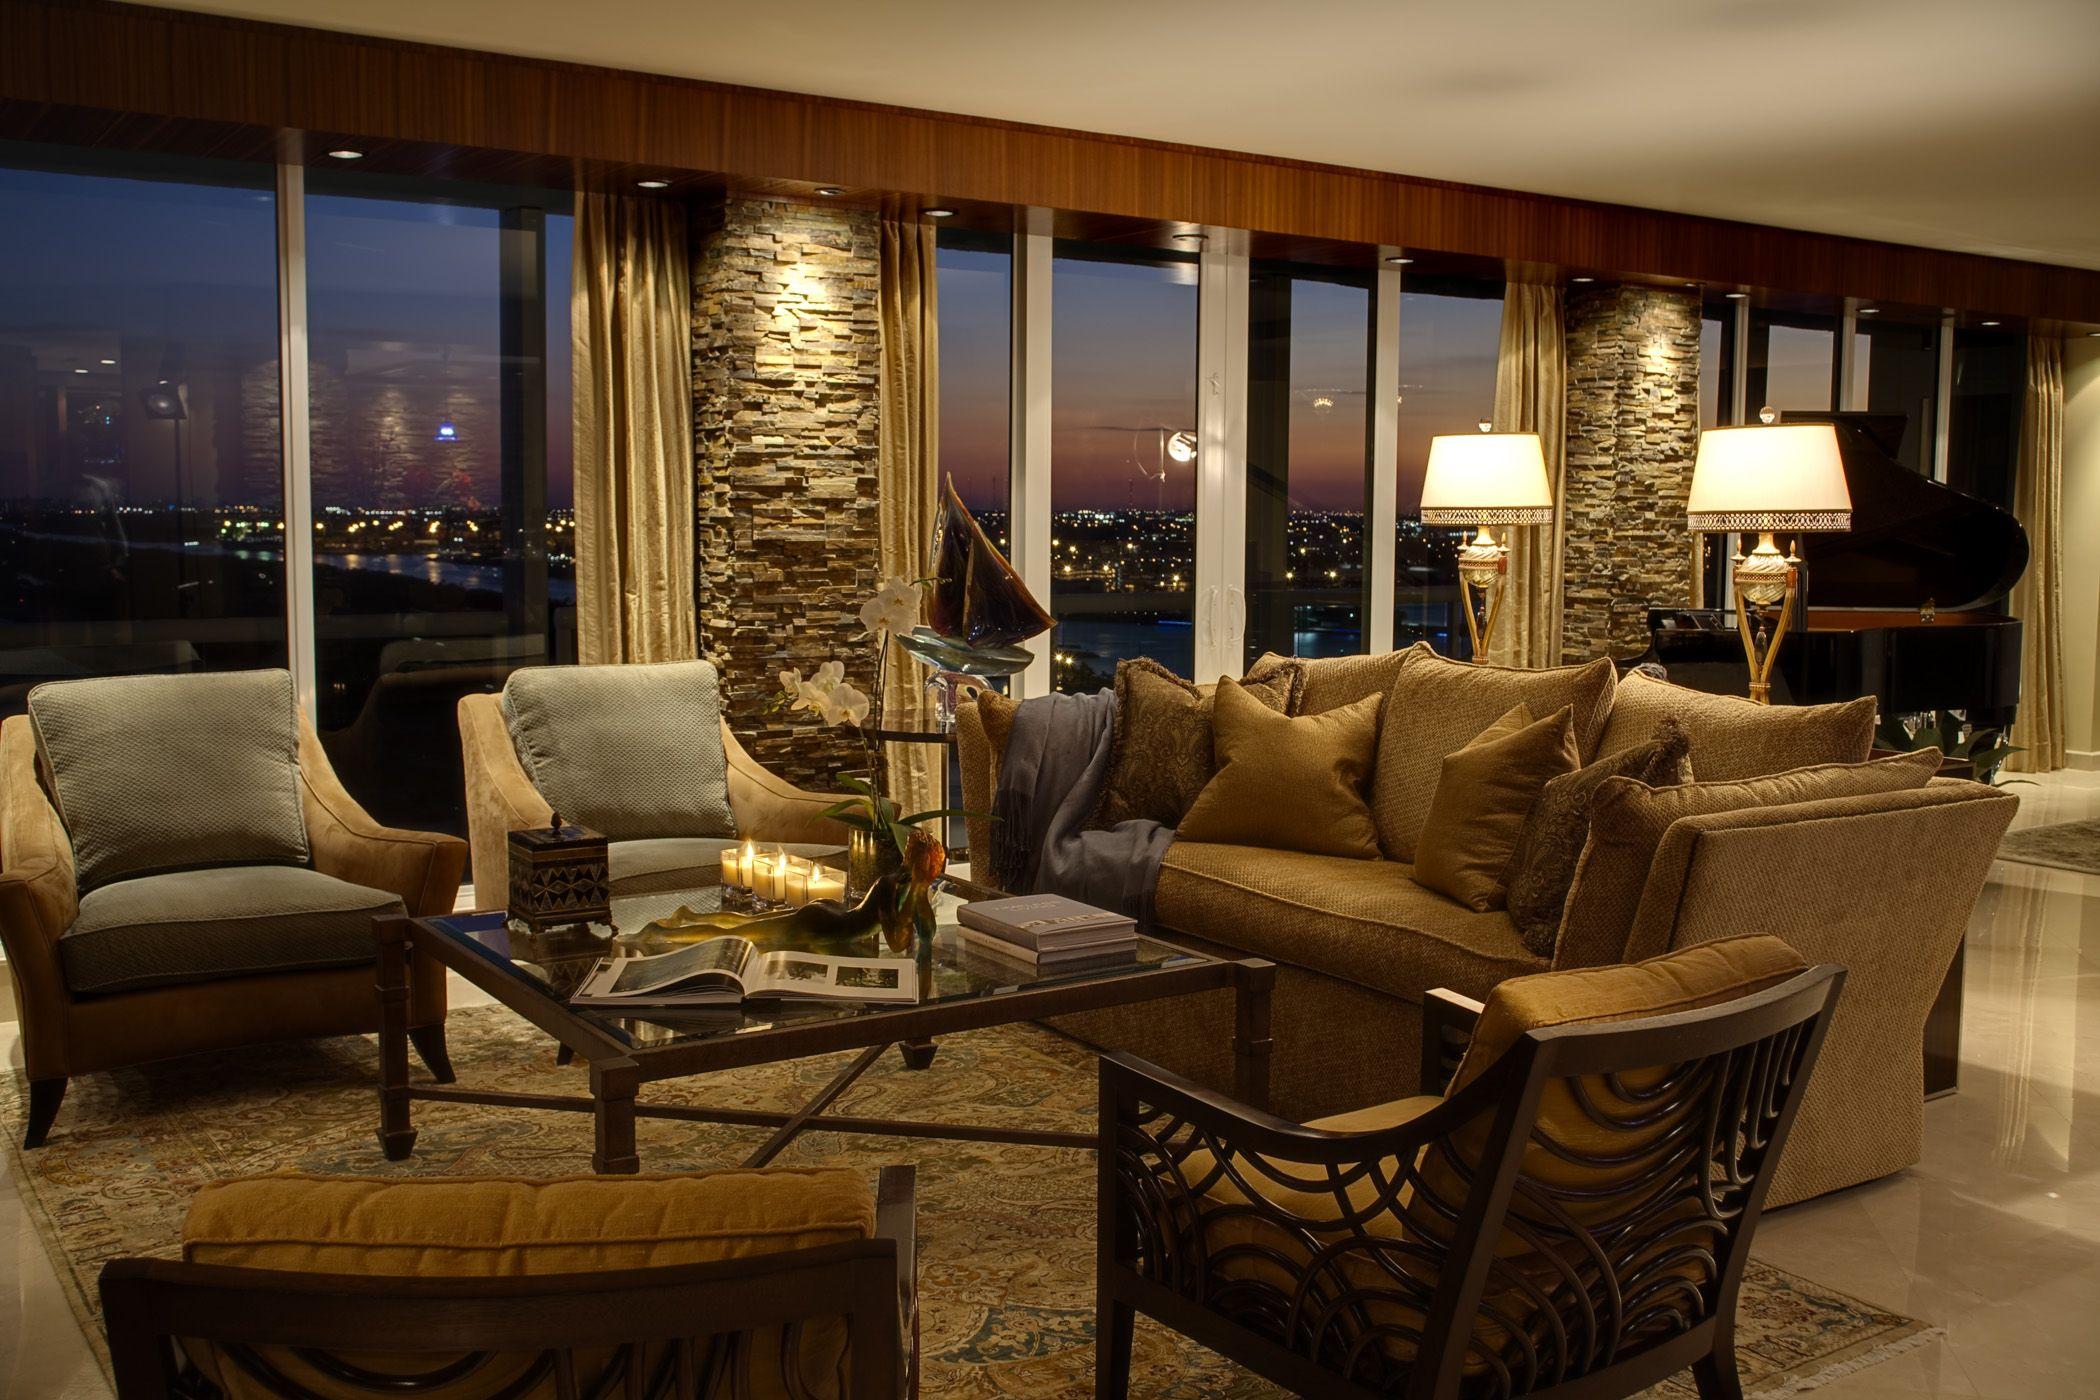 Michael blum designs penthouse in boca raton fl rattan manhattan lounge chairs by david francis